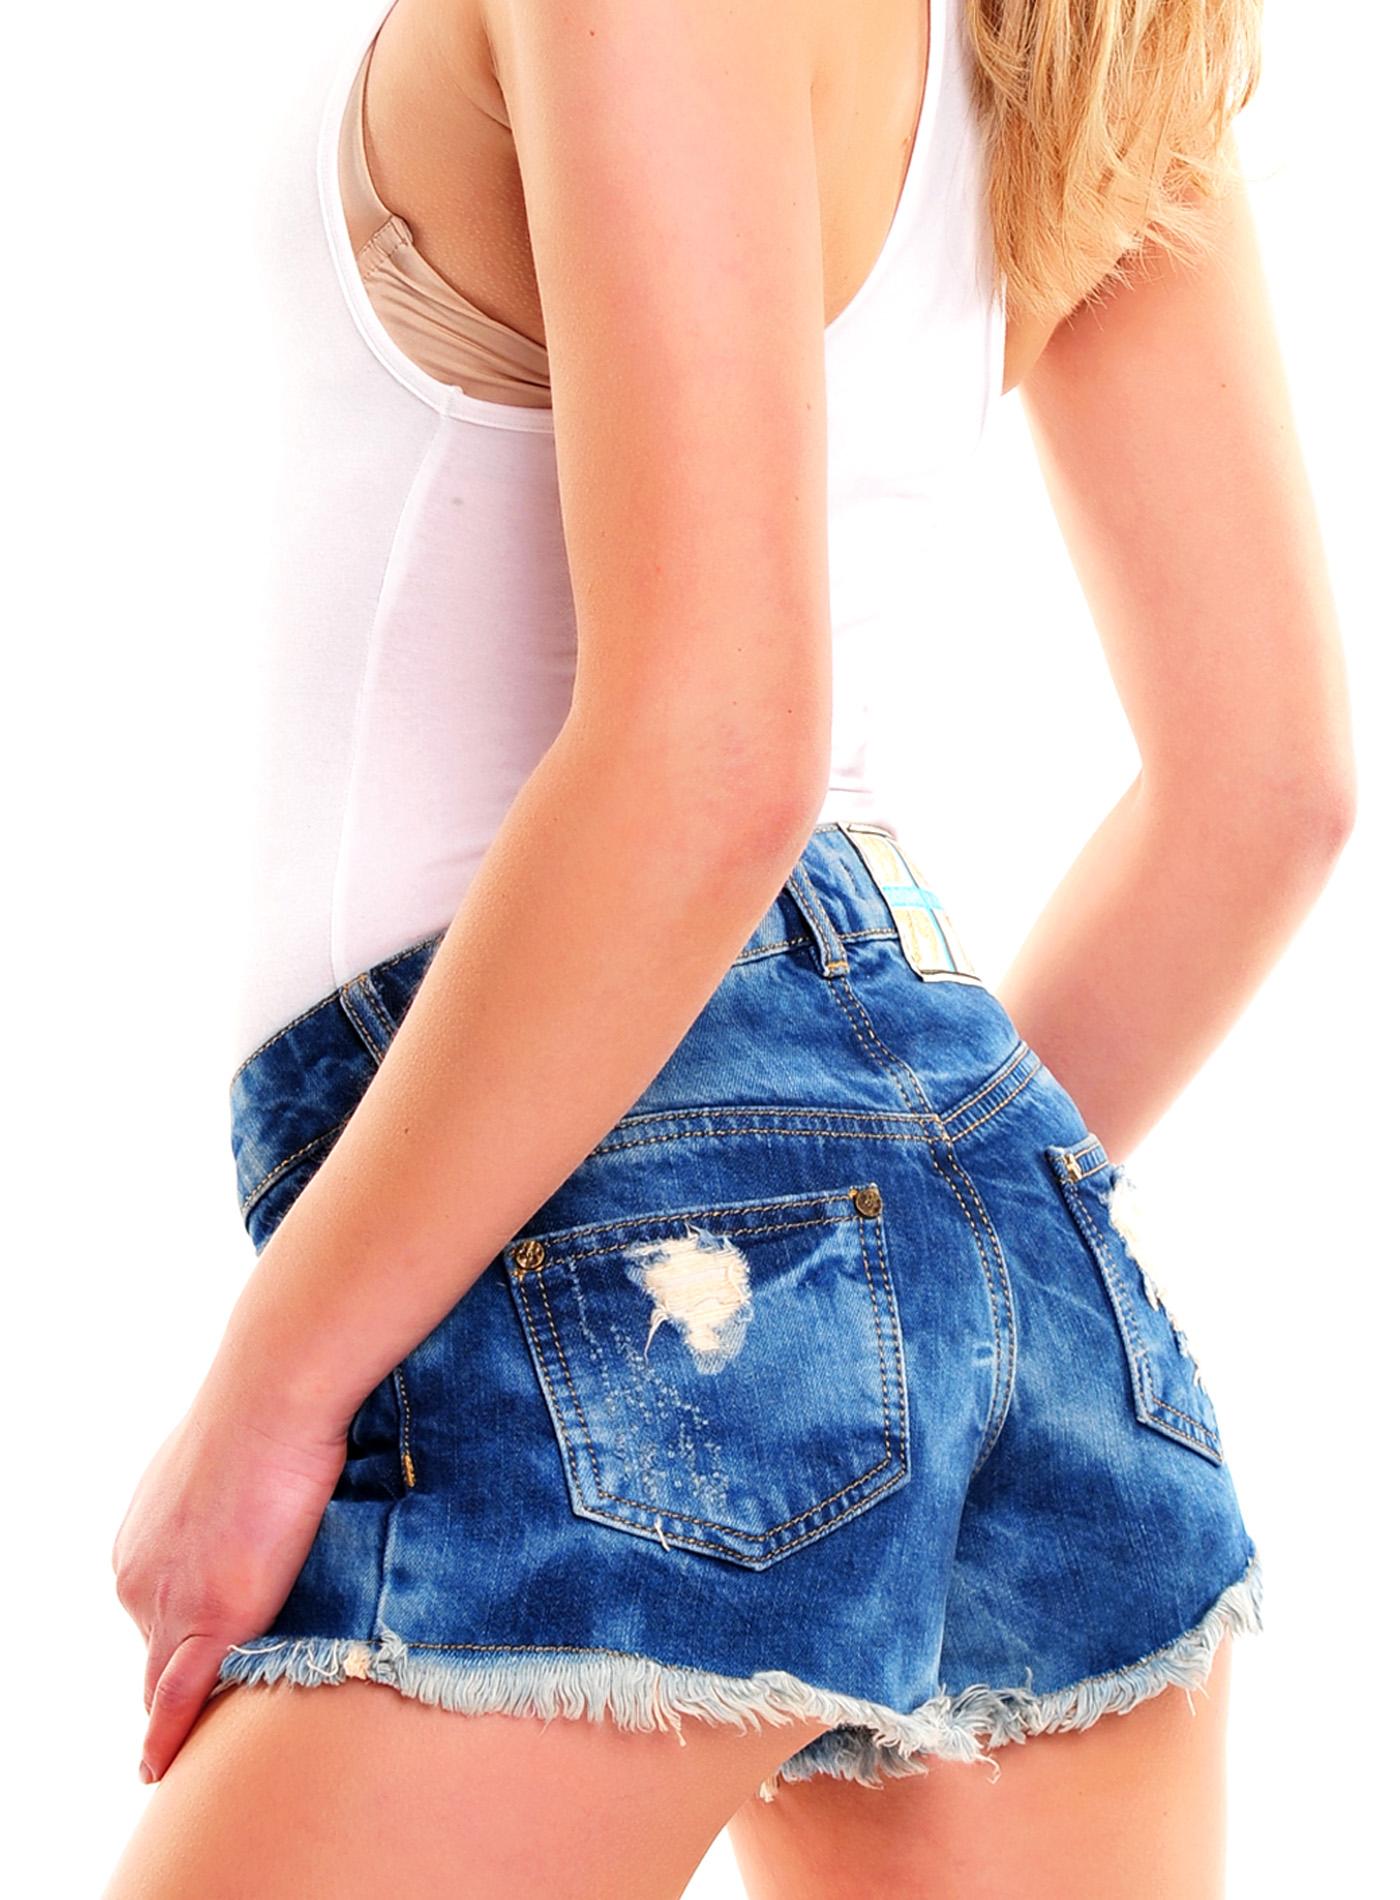 tazzio design damen jeans shorts jeans kurz hose damenjeans hotpants tz 802 blau ebay. Black Bedroom Furniture Sets. Home Design Ideas